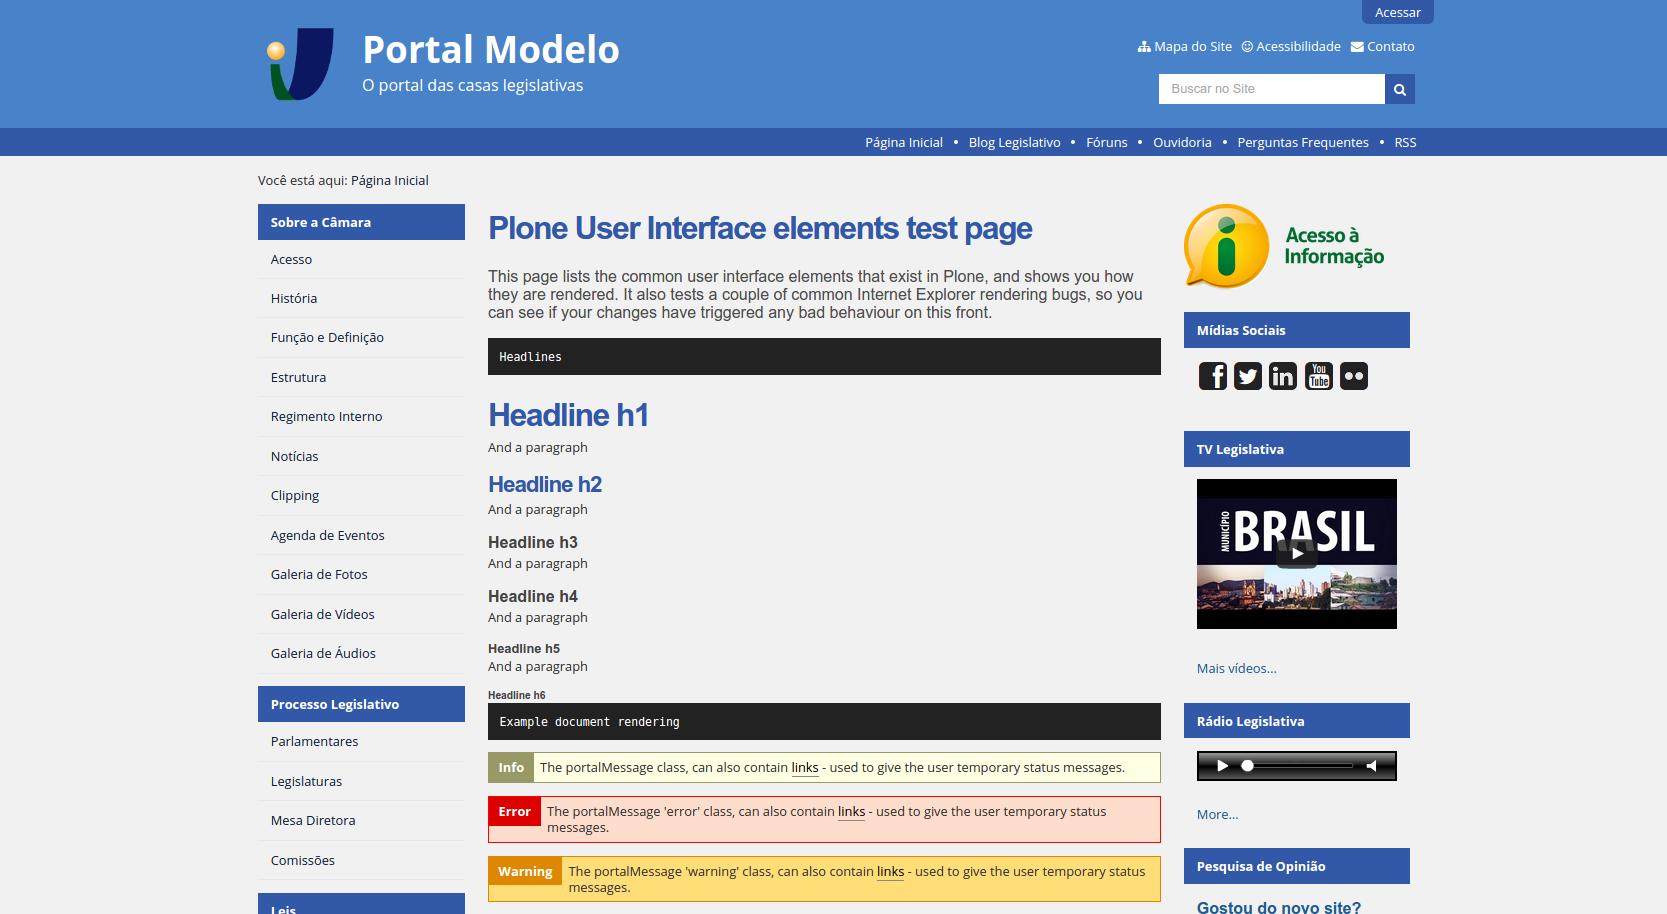 https://raw.githubusercontent.com/interlegis/interlegis.portalmodelo.theme/master/src/interlegis/portalmodelo/theme/themes/Interlegis/preview.png